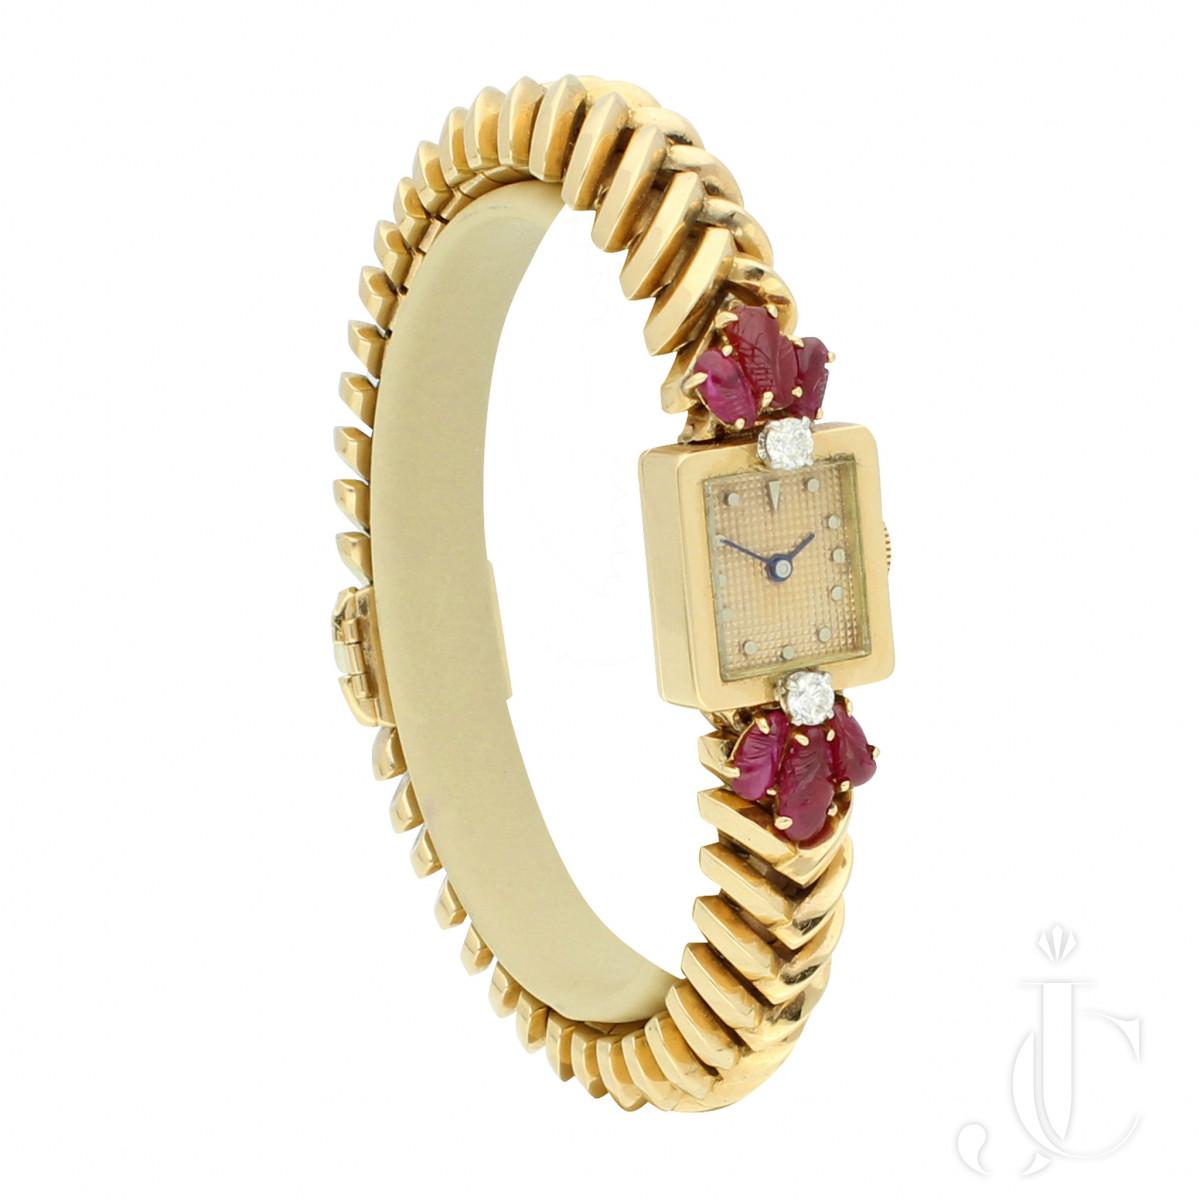 Mauboussin Ruby and Diamond Set Bracelet Watch